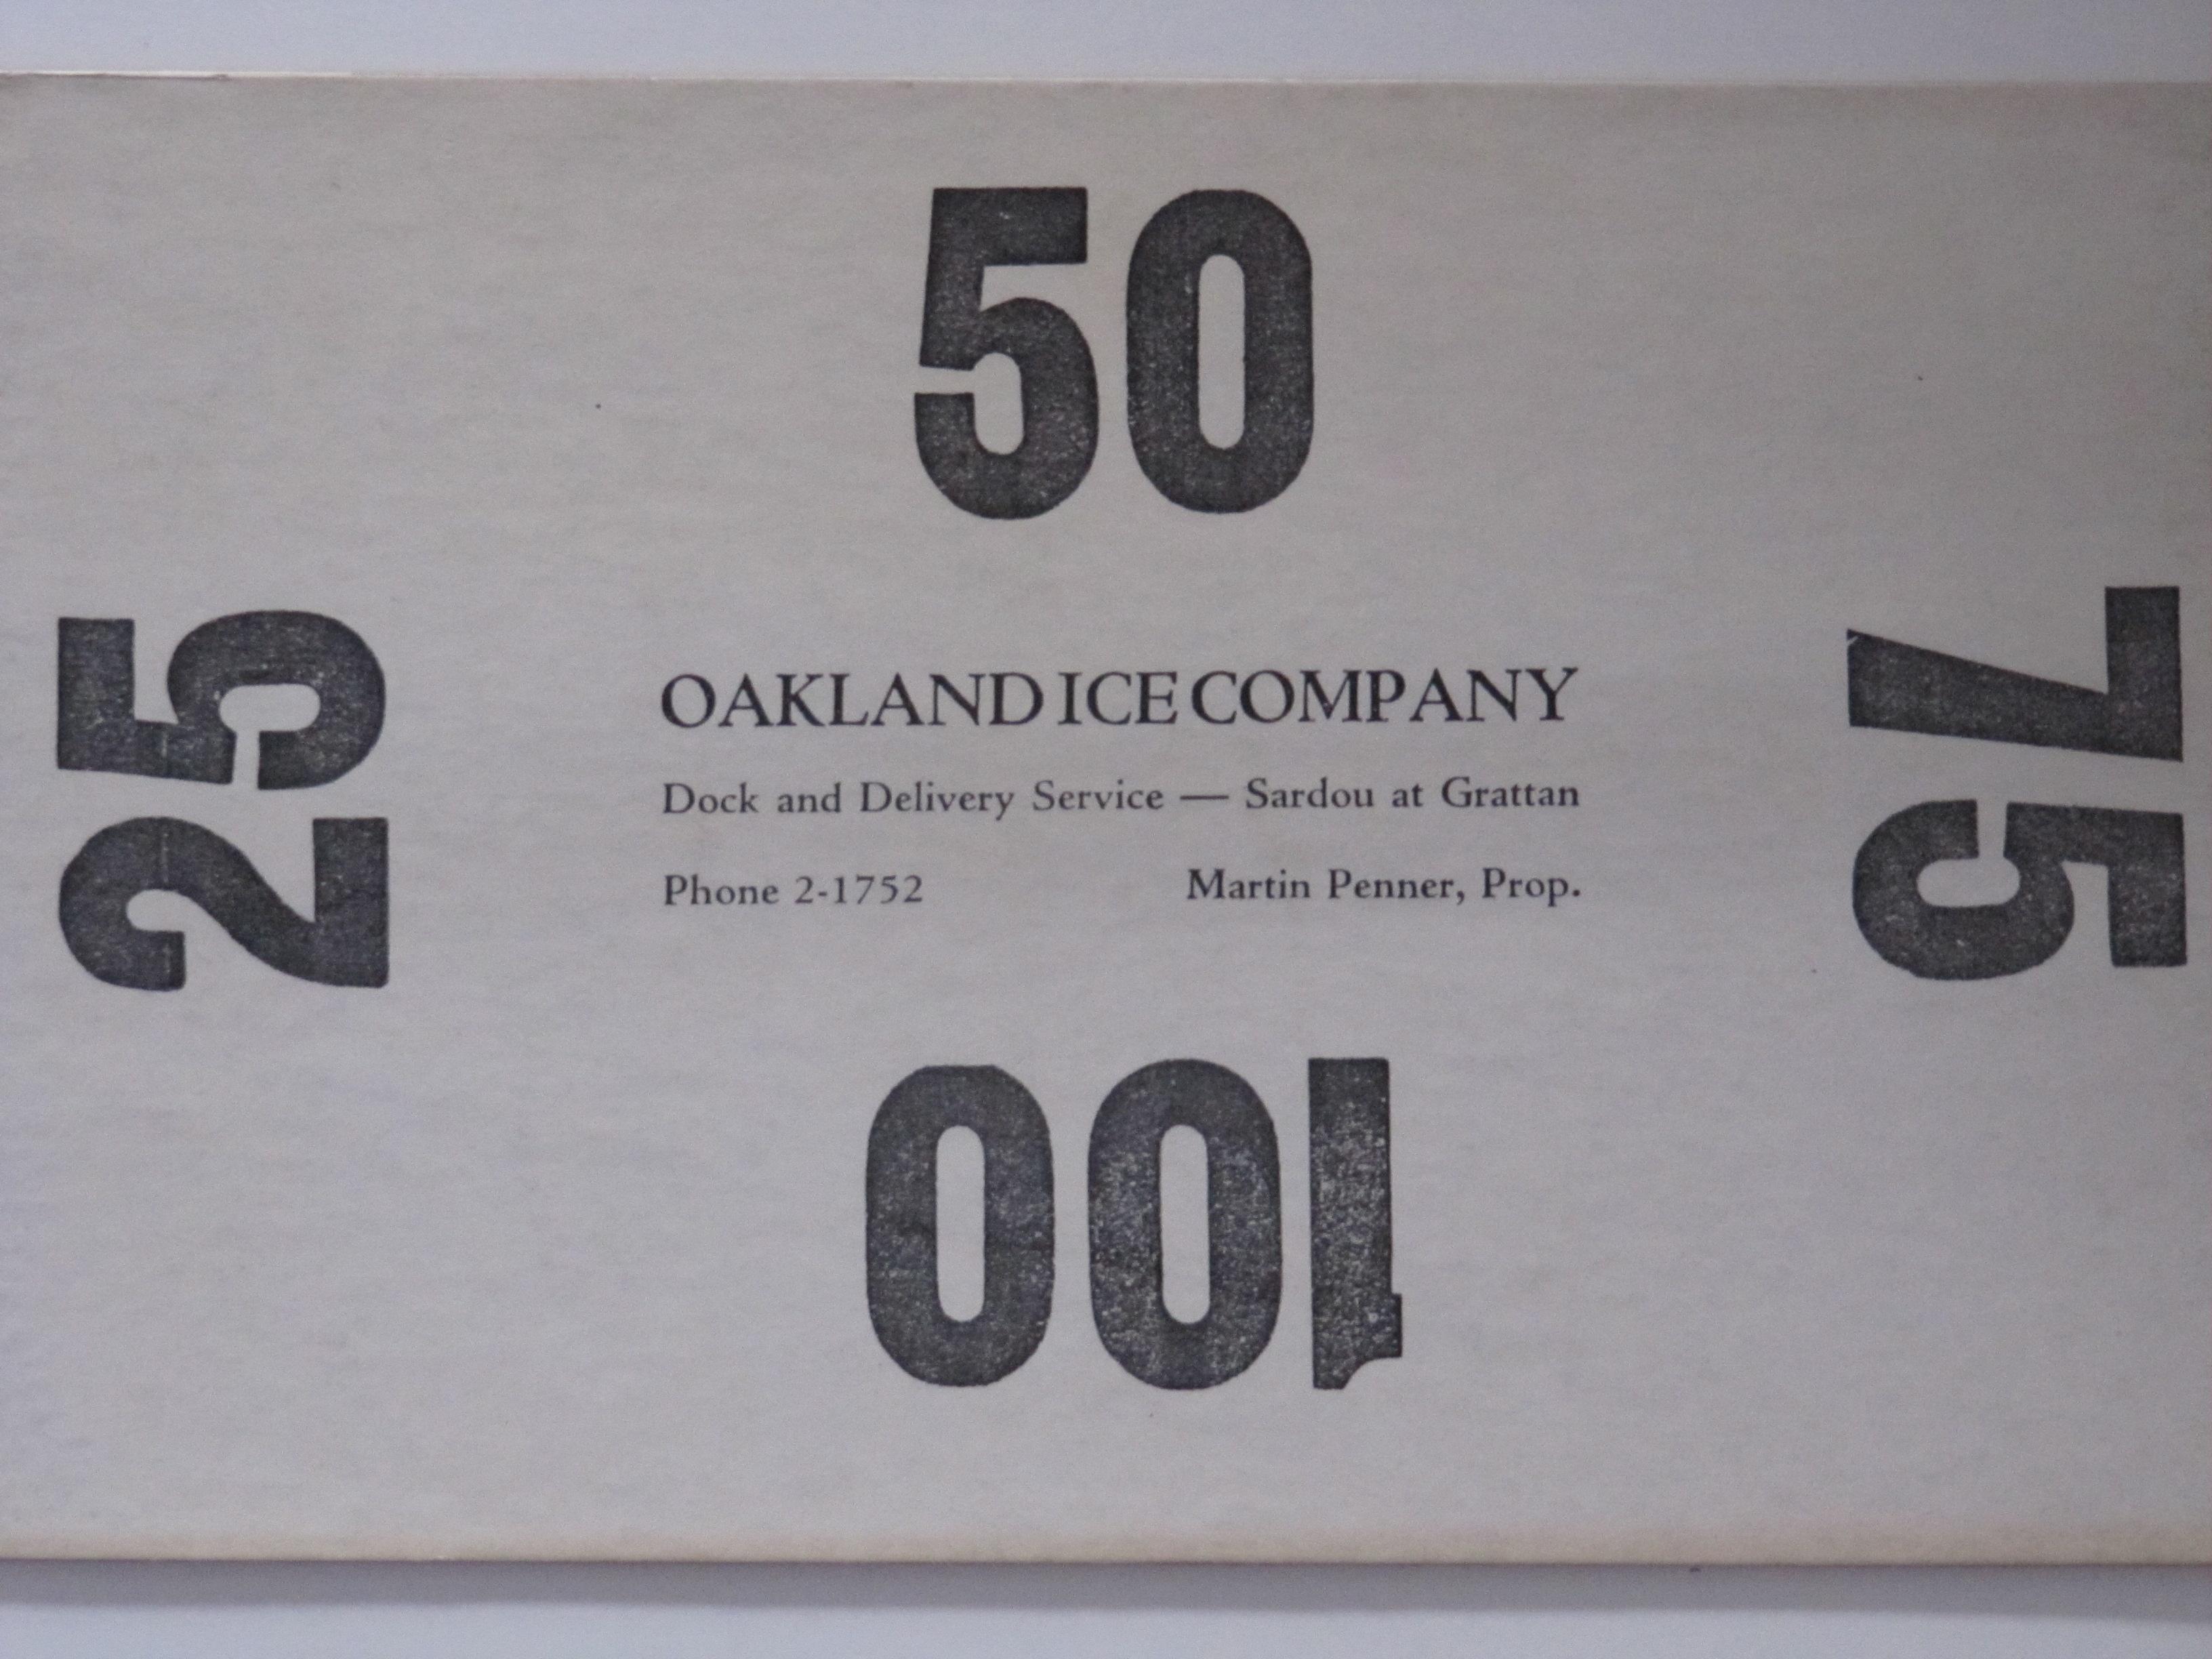 Oakland Ice Co.